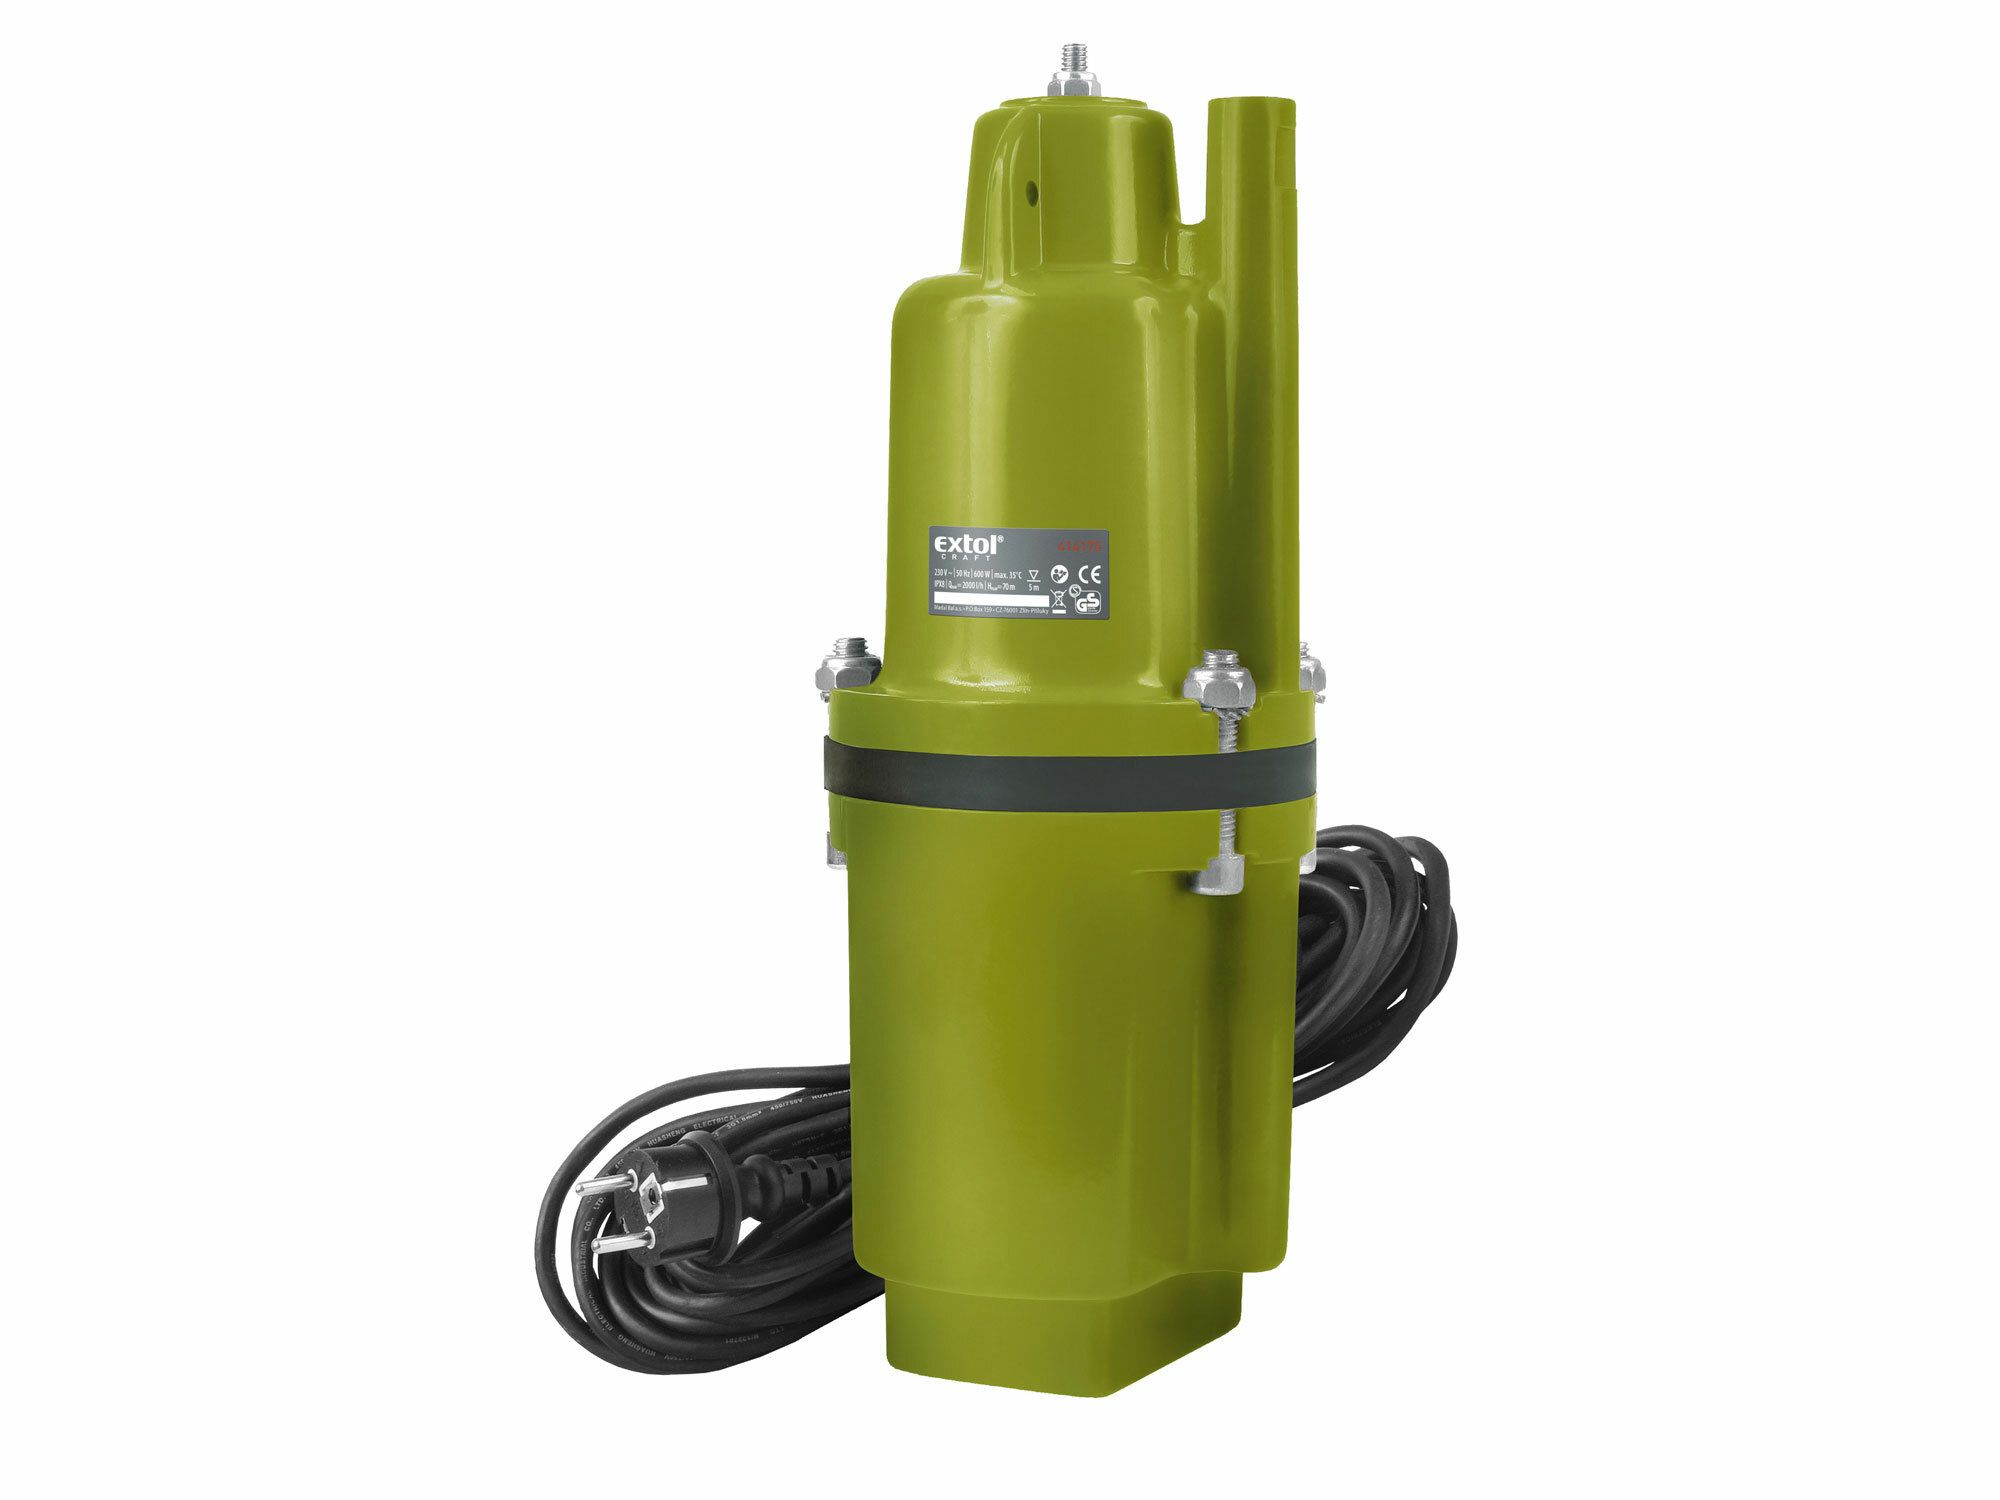 Čerpadlo membránové hlbinné ponorné, 600W, 2000l/hod, 10m, EXTOL CRAFT, 414175